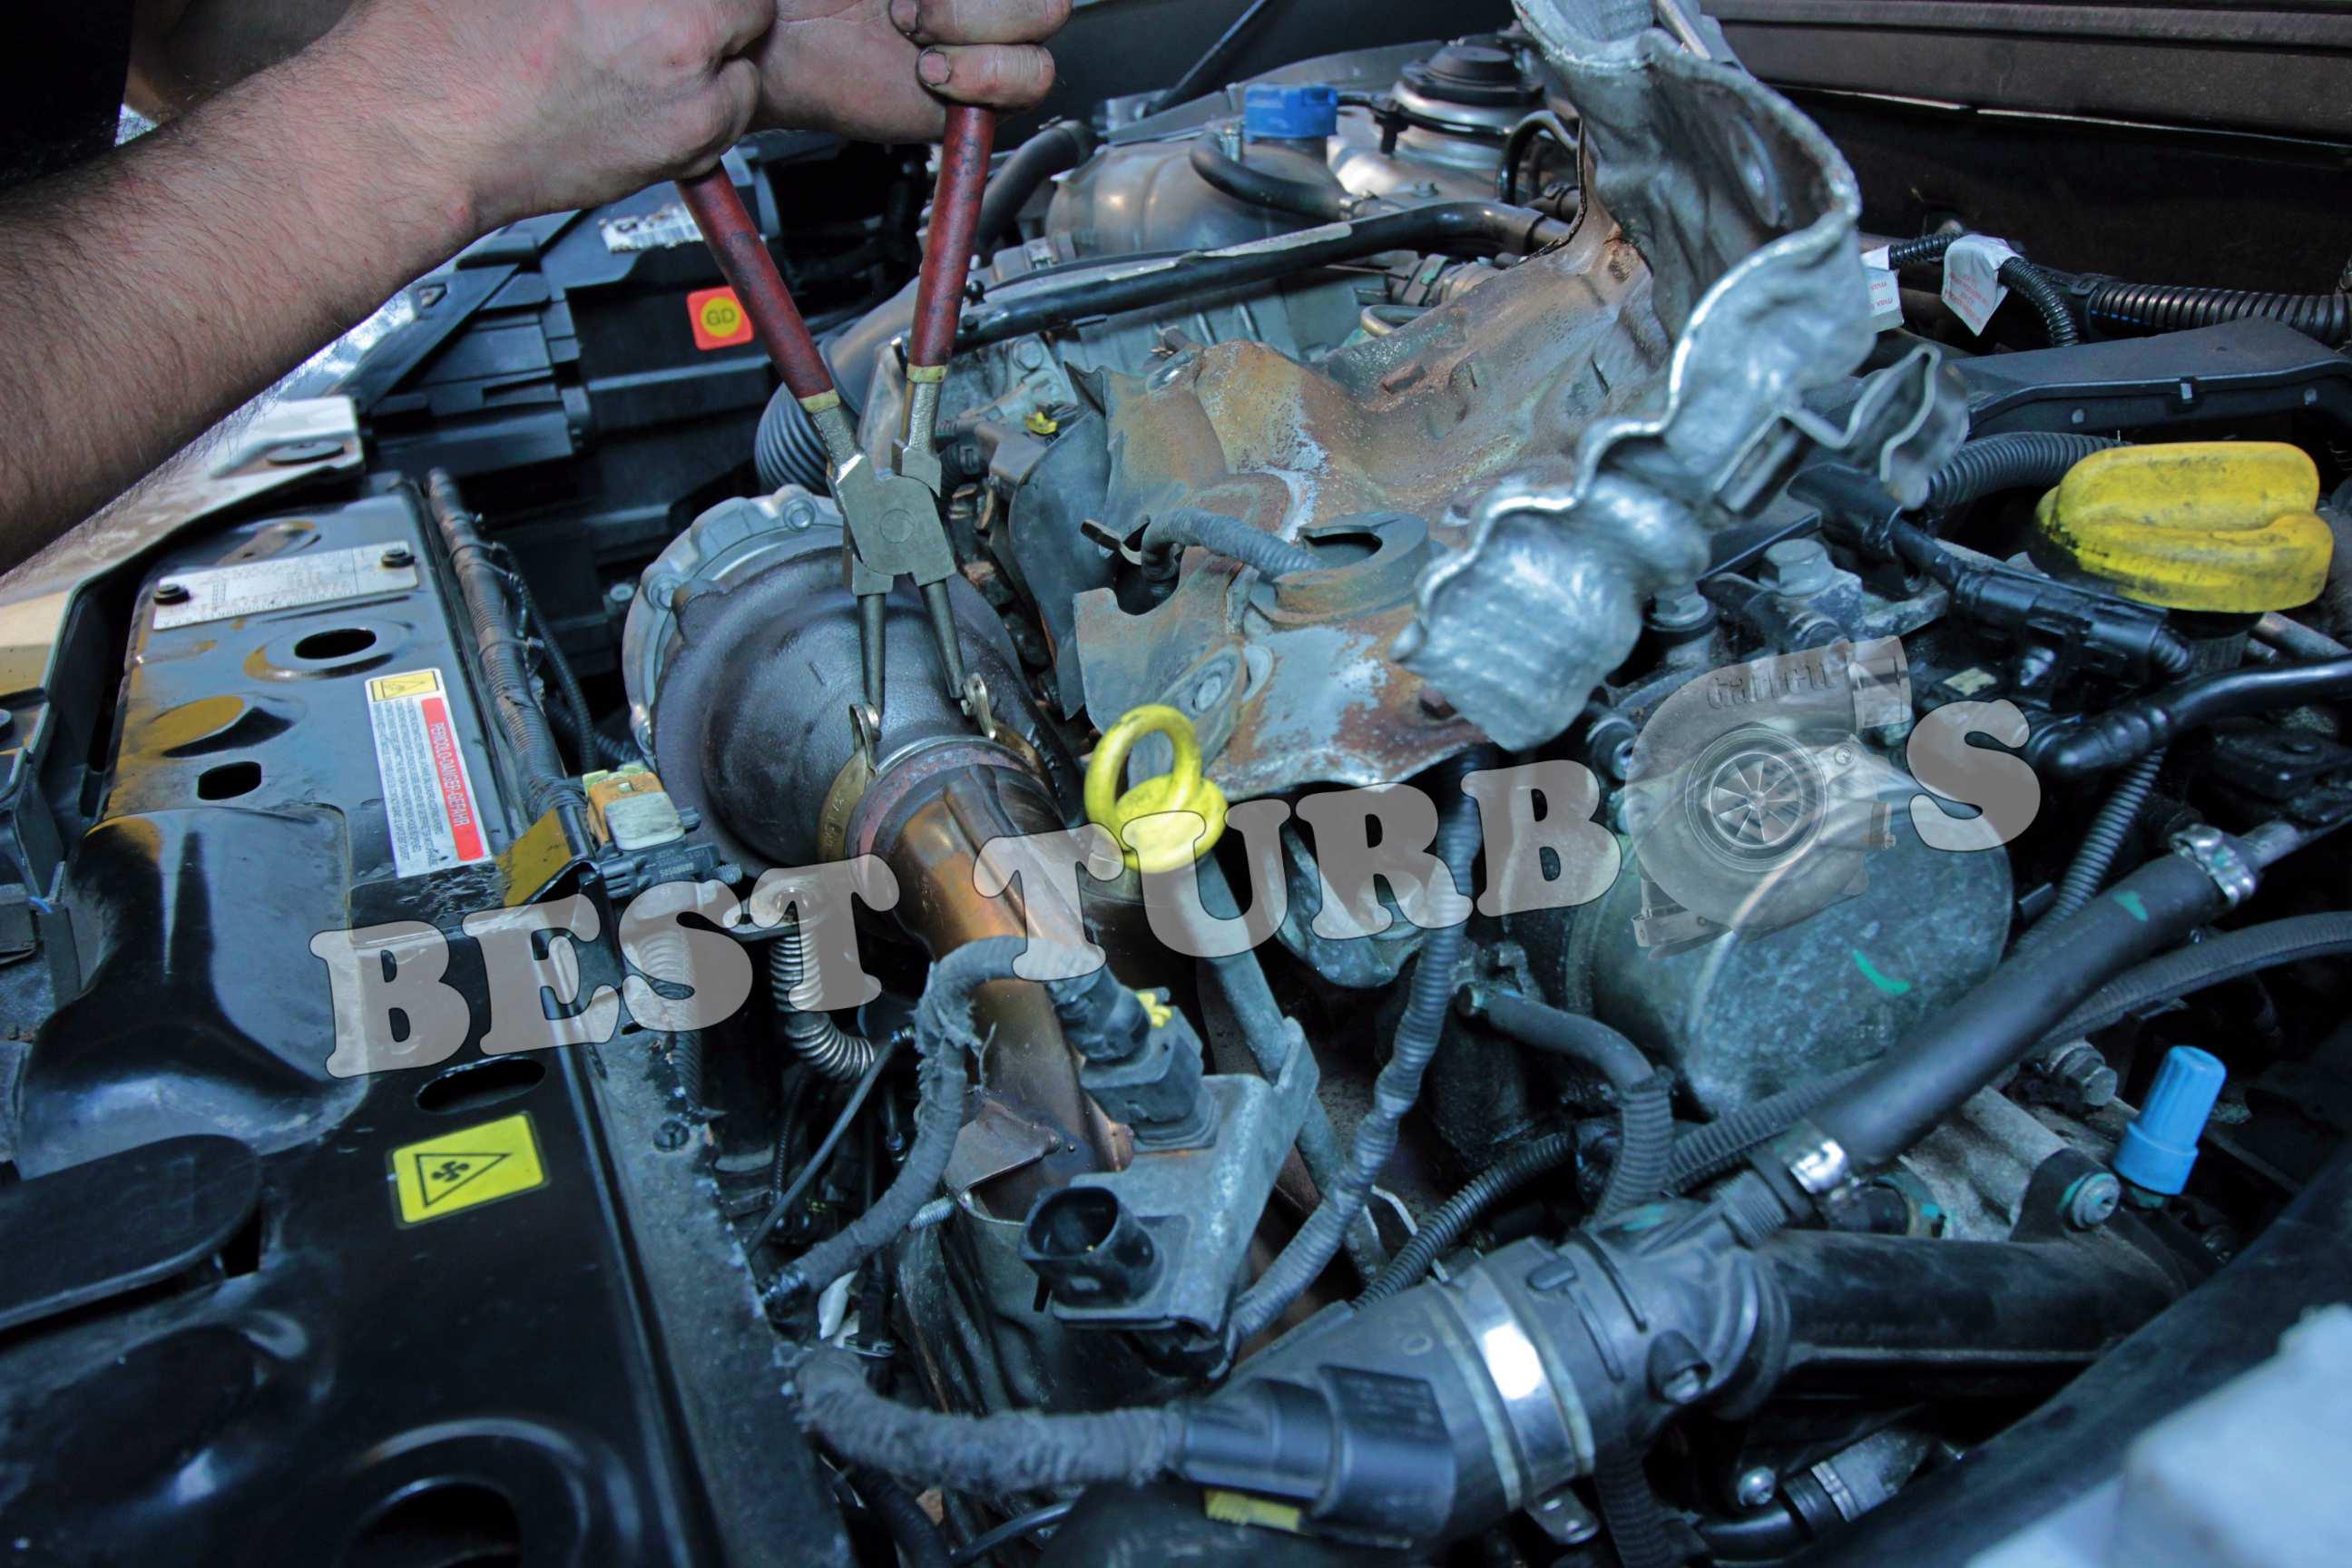 Alfa-Romeo Giulietta 2.0 JTDM Turbocharger Recon